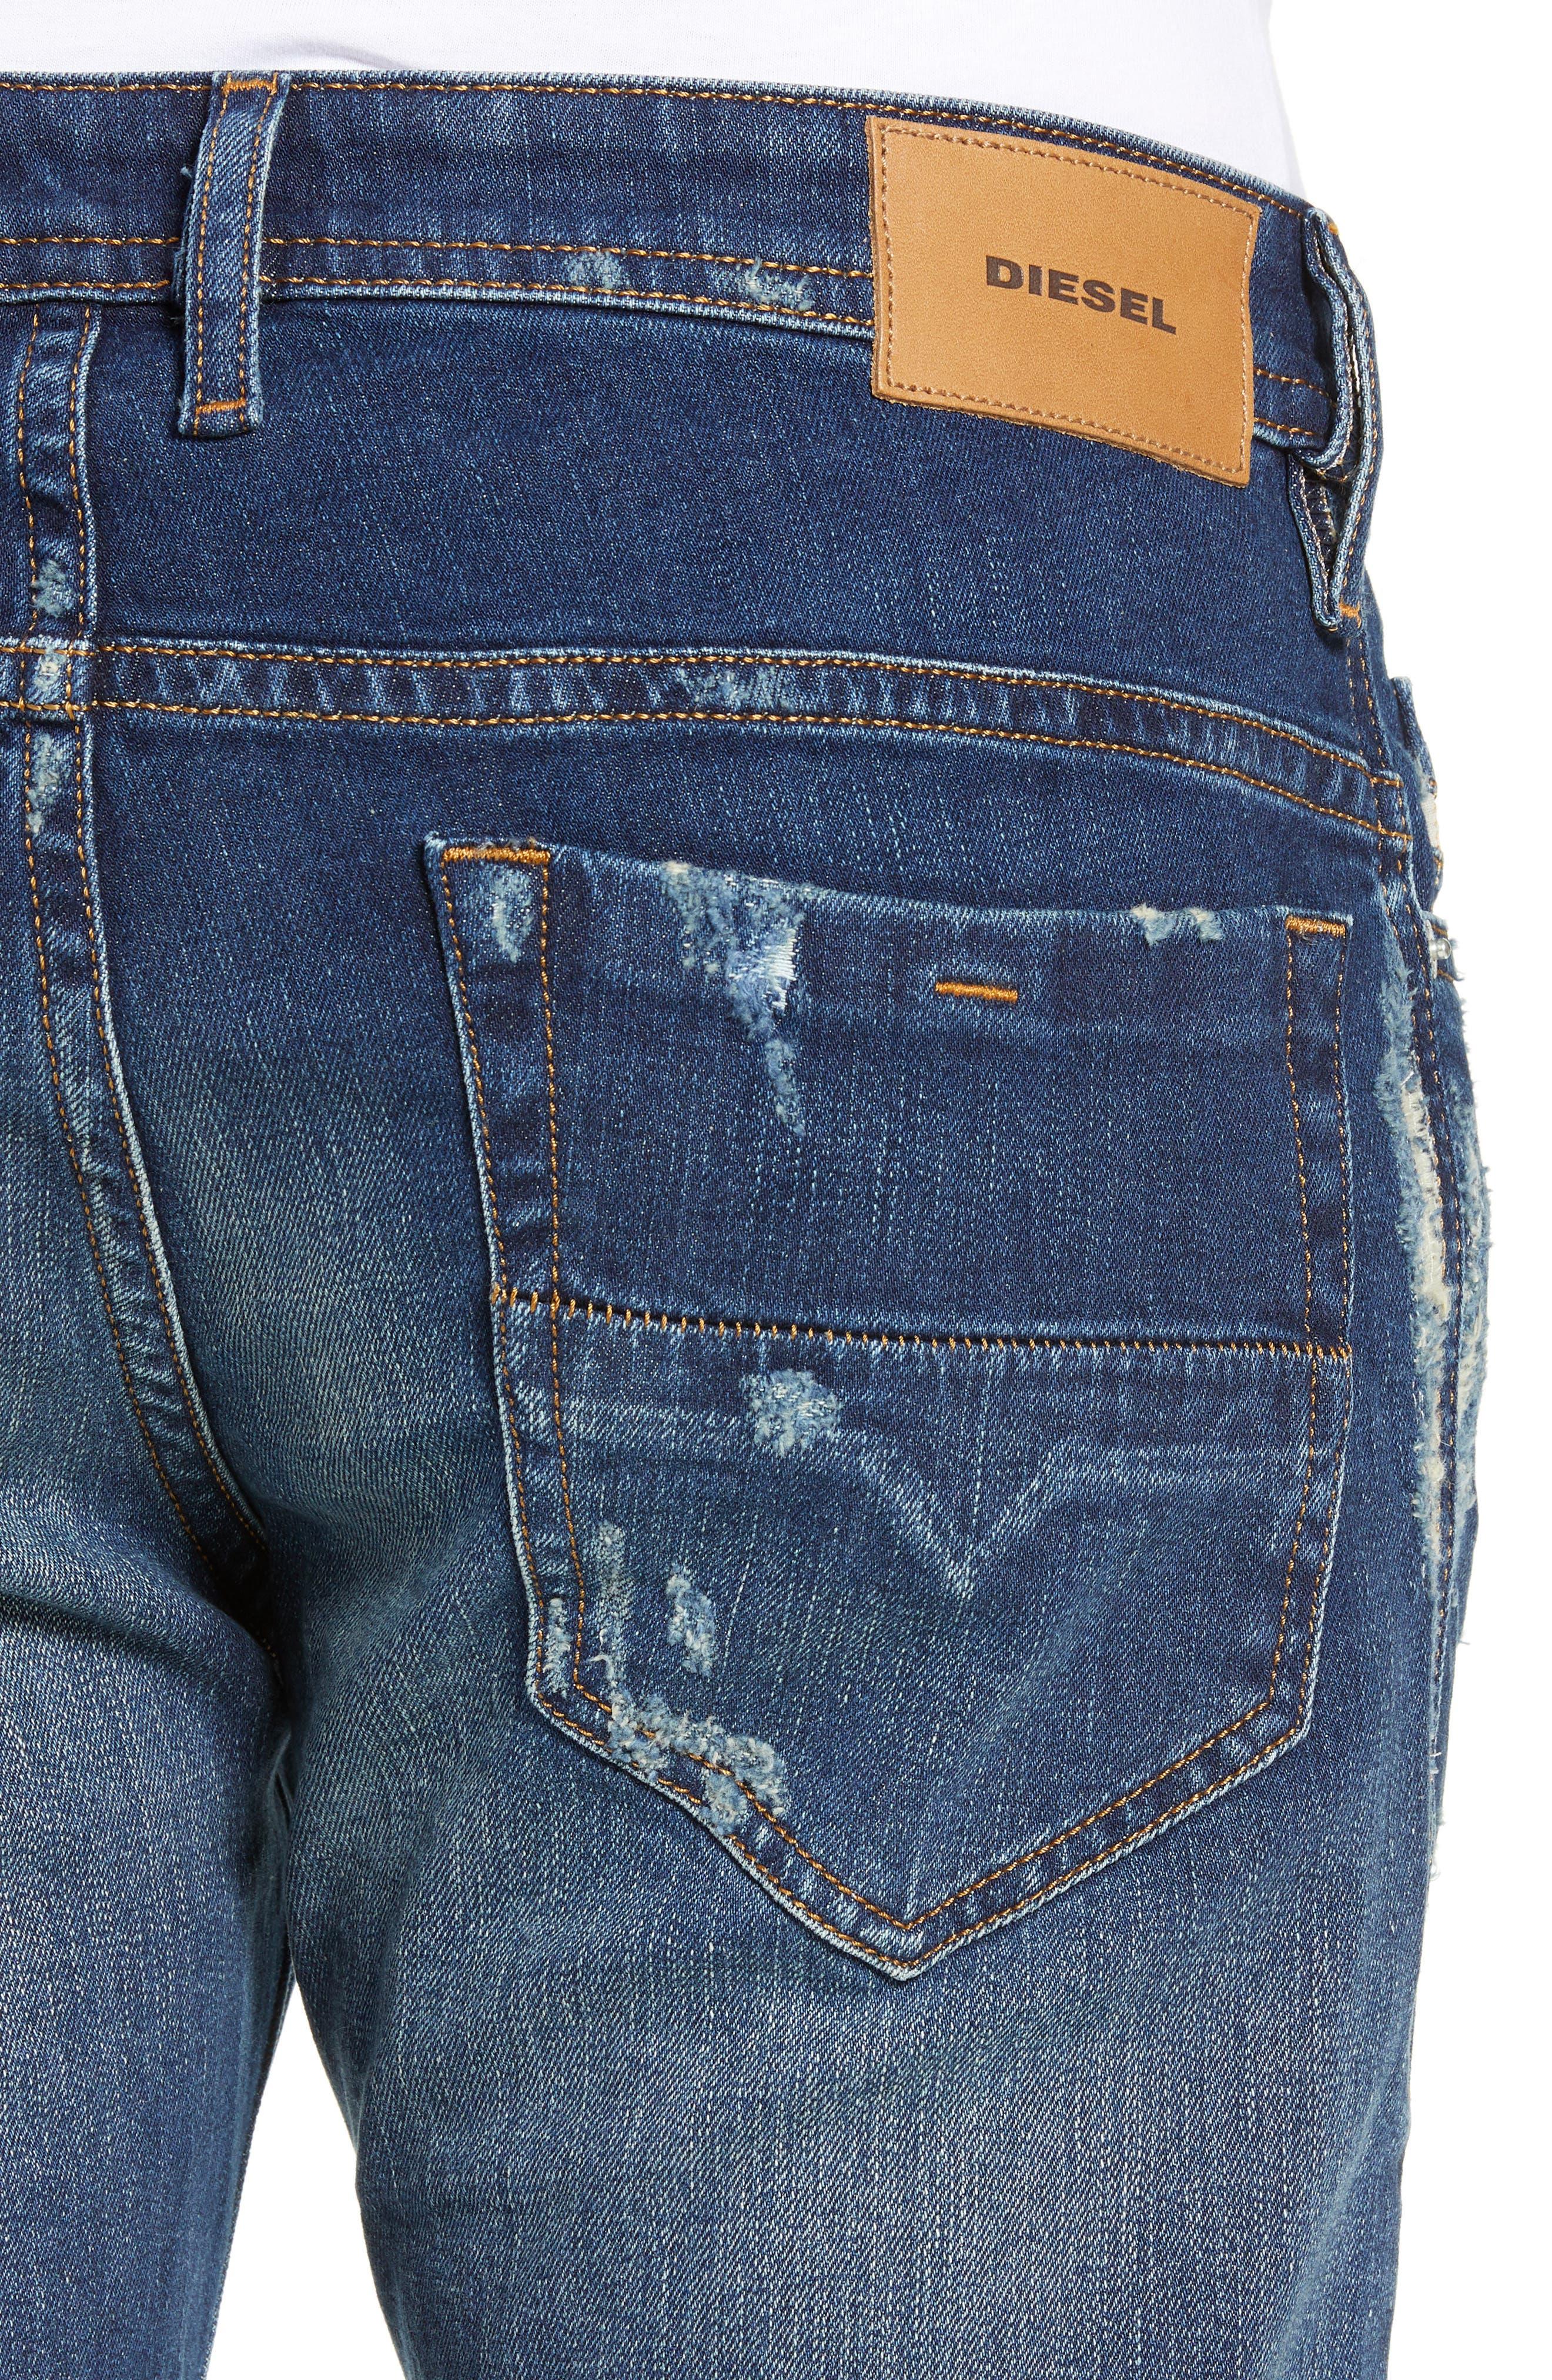 Thommer Slim Fit Jeans,                             Alternate thumbnail 4, color,                             084YY